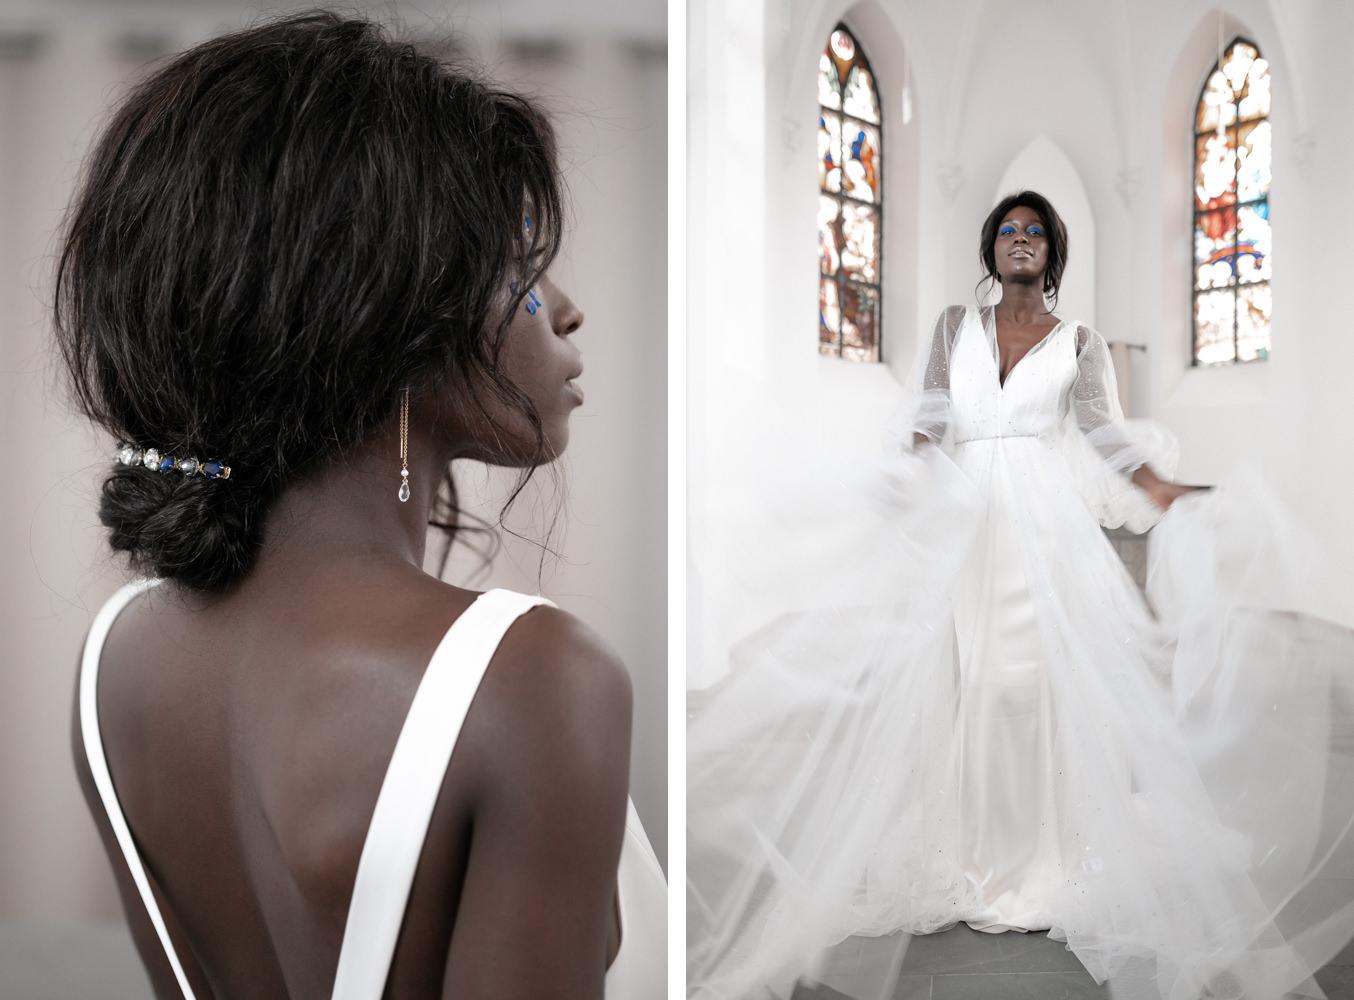 Braut in Kirche mit Jenny Packham Brautkleid